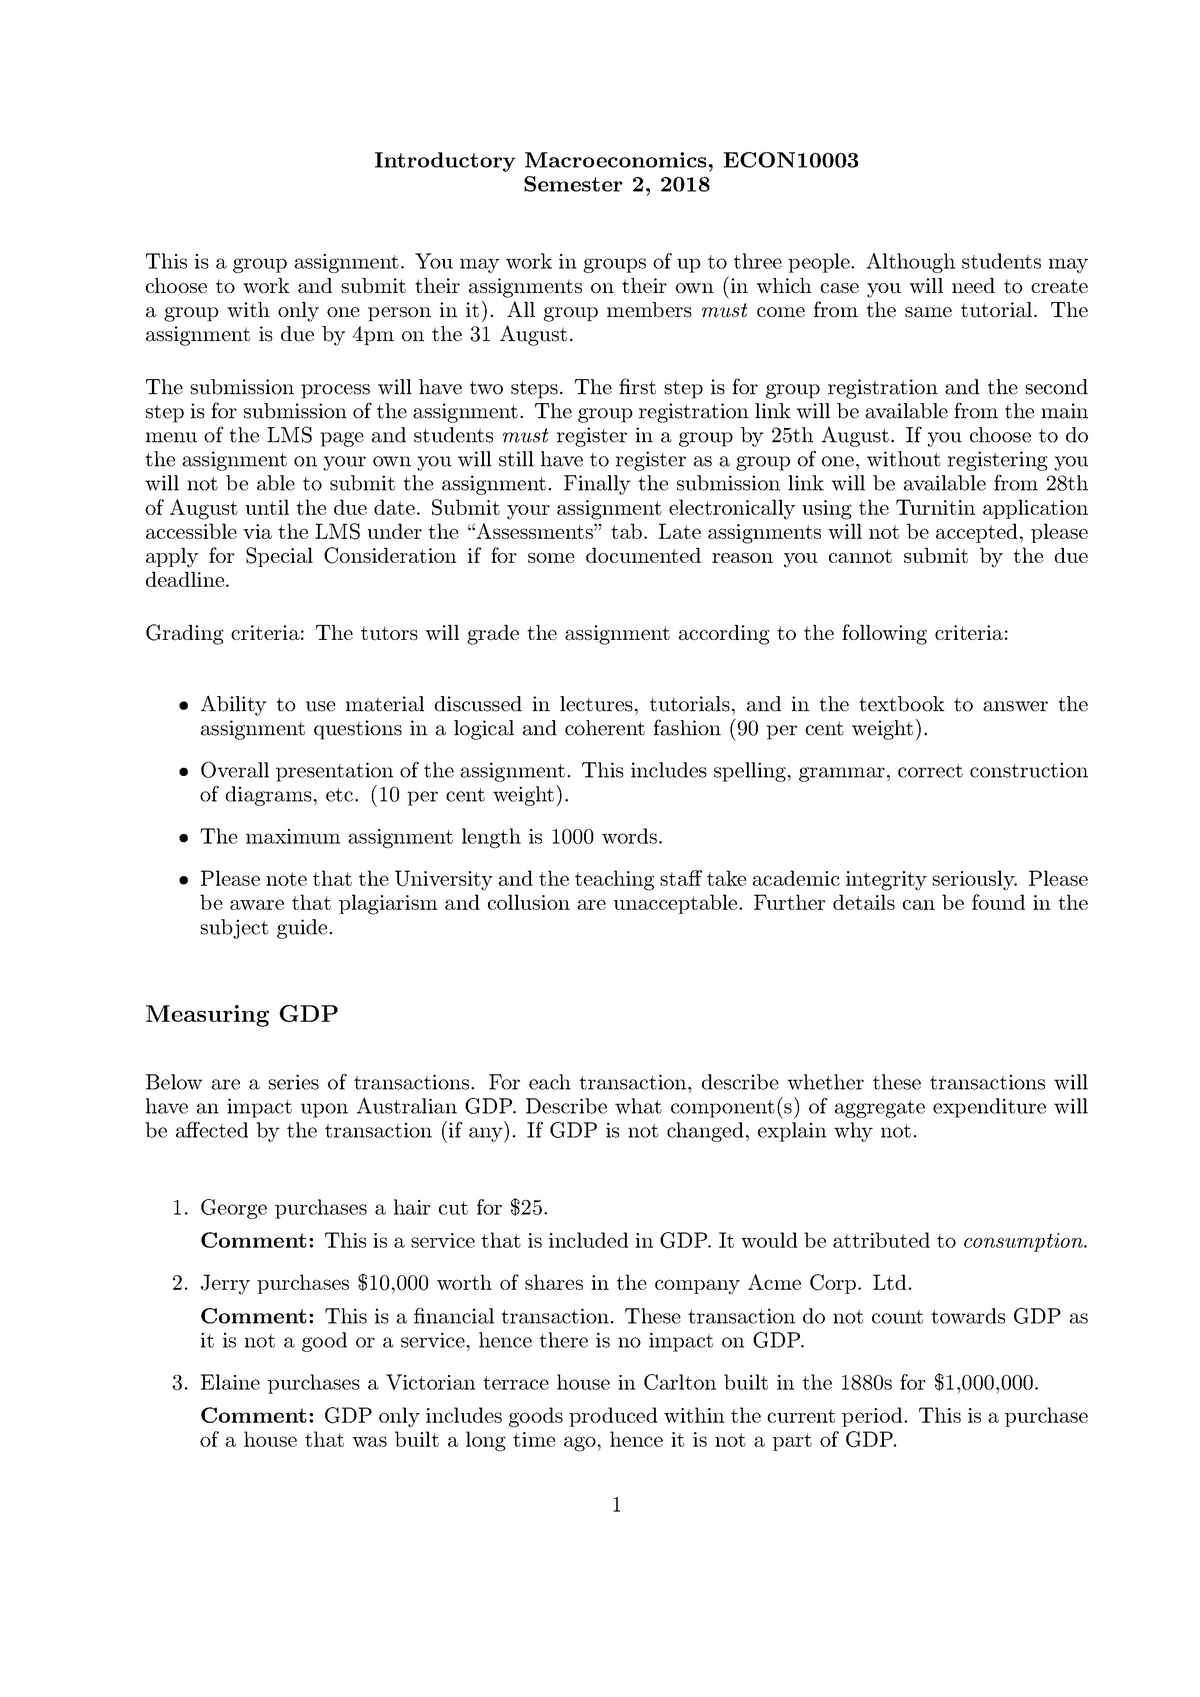 Solution 1 2018S2 - ECON10003: Introductory Macroeconomics